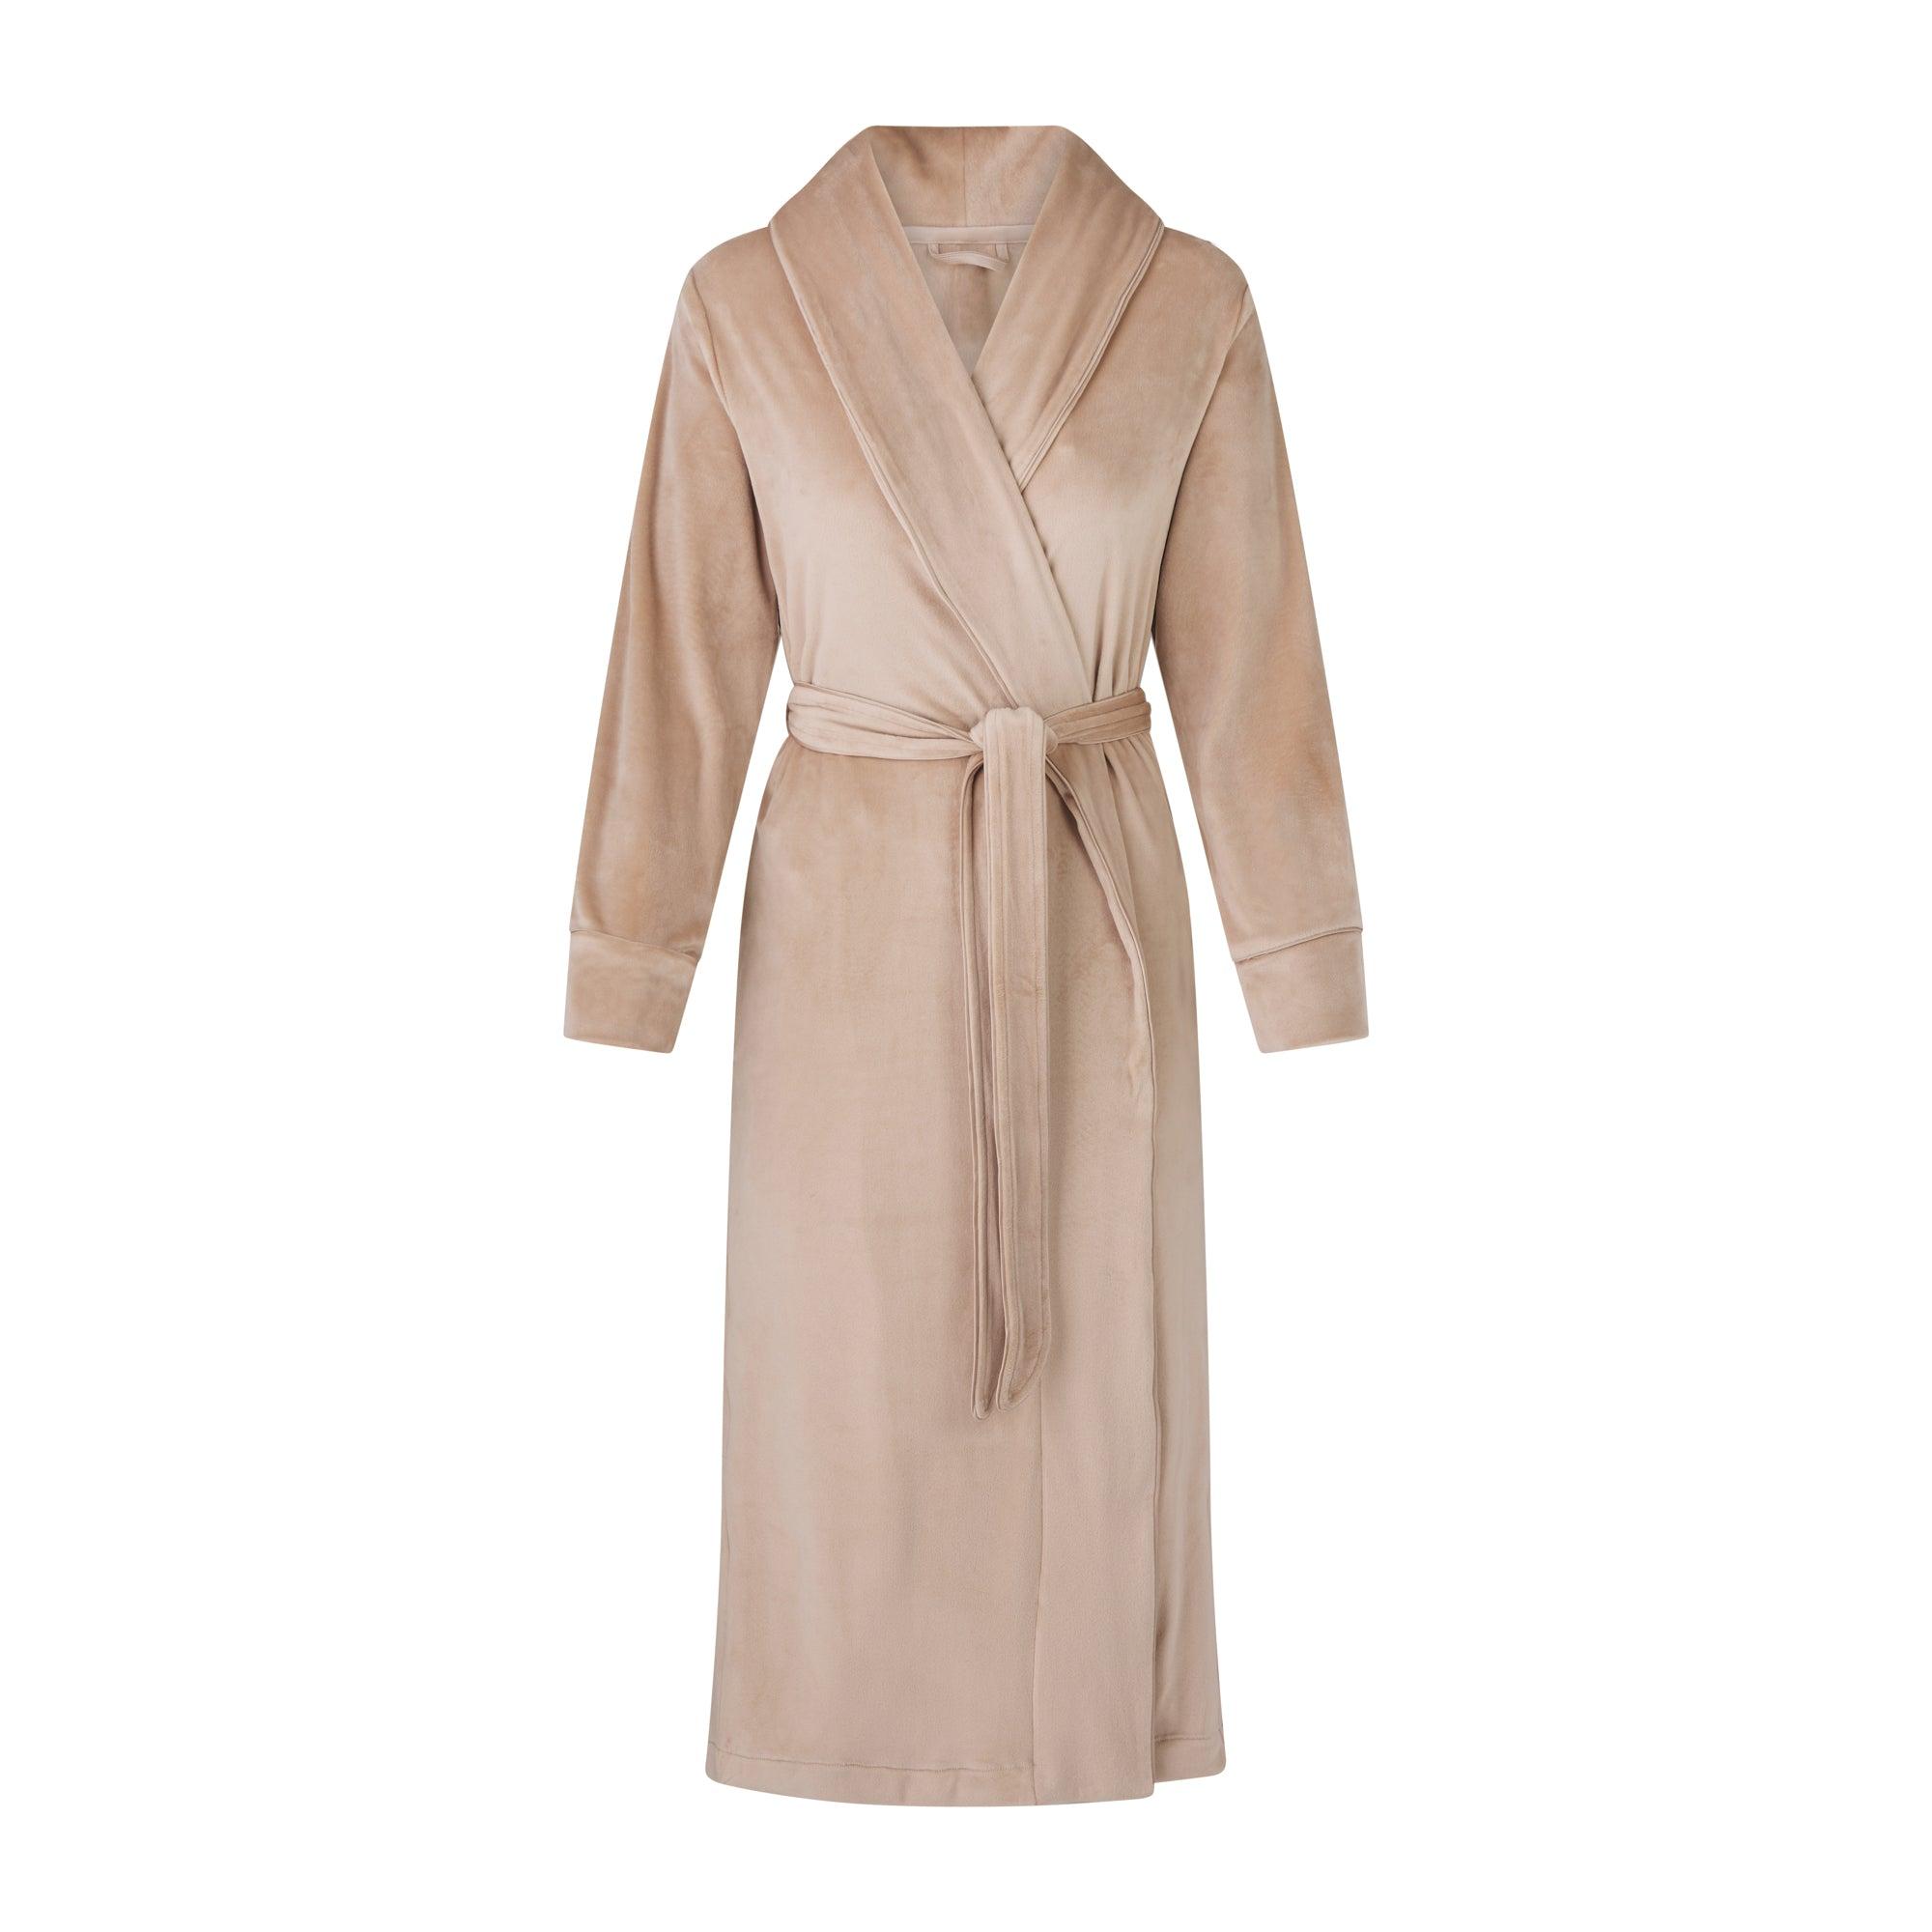 SKIMS Women's Velour Long Robe - Nude - Size XXS; Nude